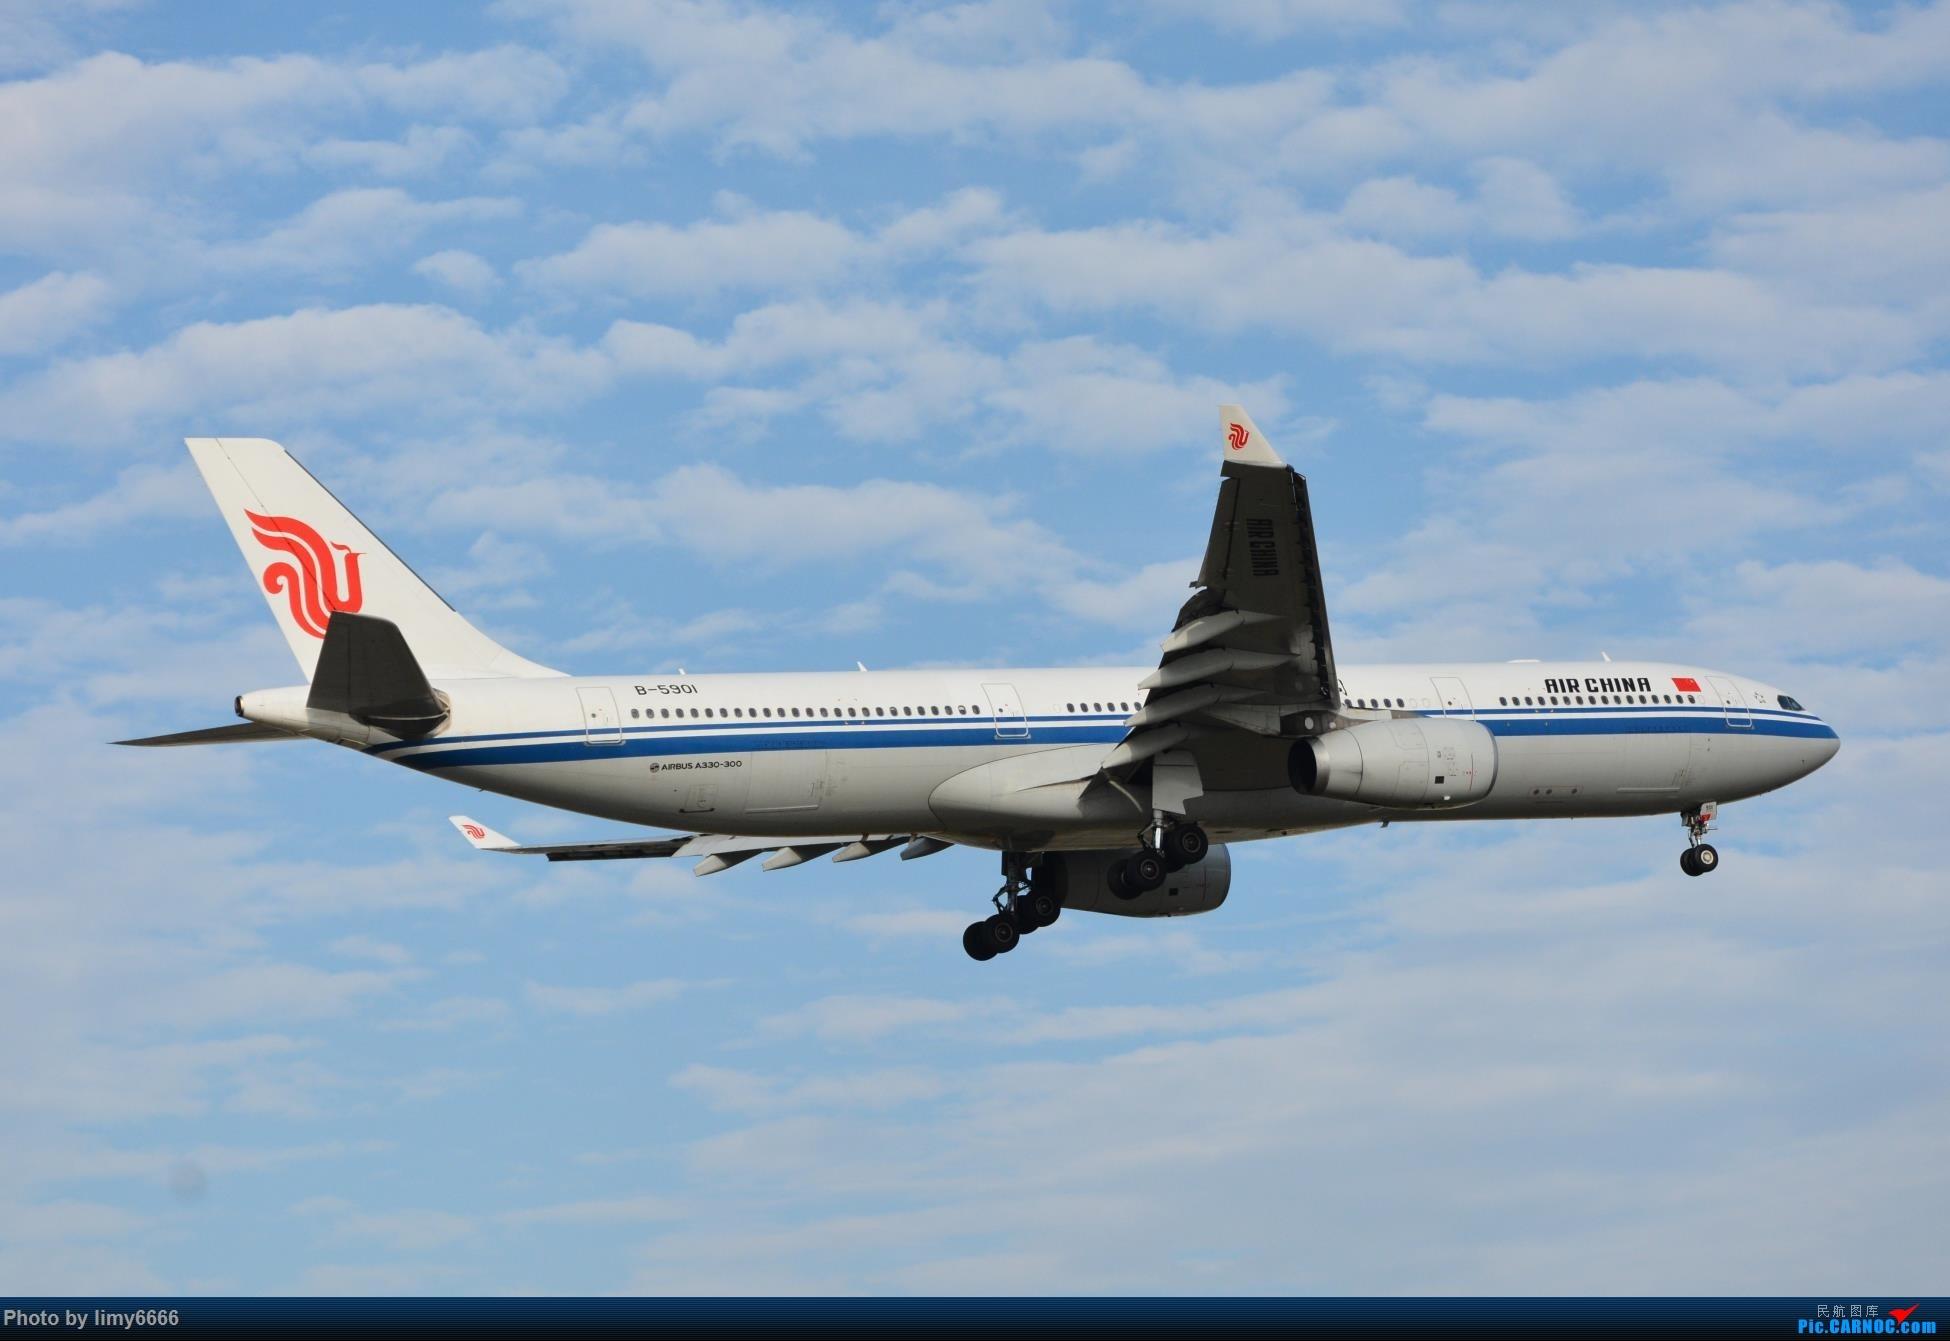 Re:[原创]上海虹桥机场拍机(在贵阳很少见或看不见的) AIRBUS A330-300 B-5901 中国上海虹桥国际机场